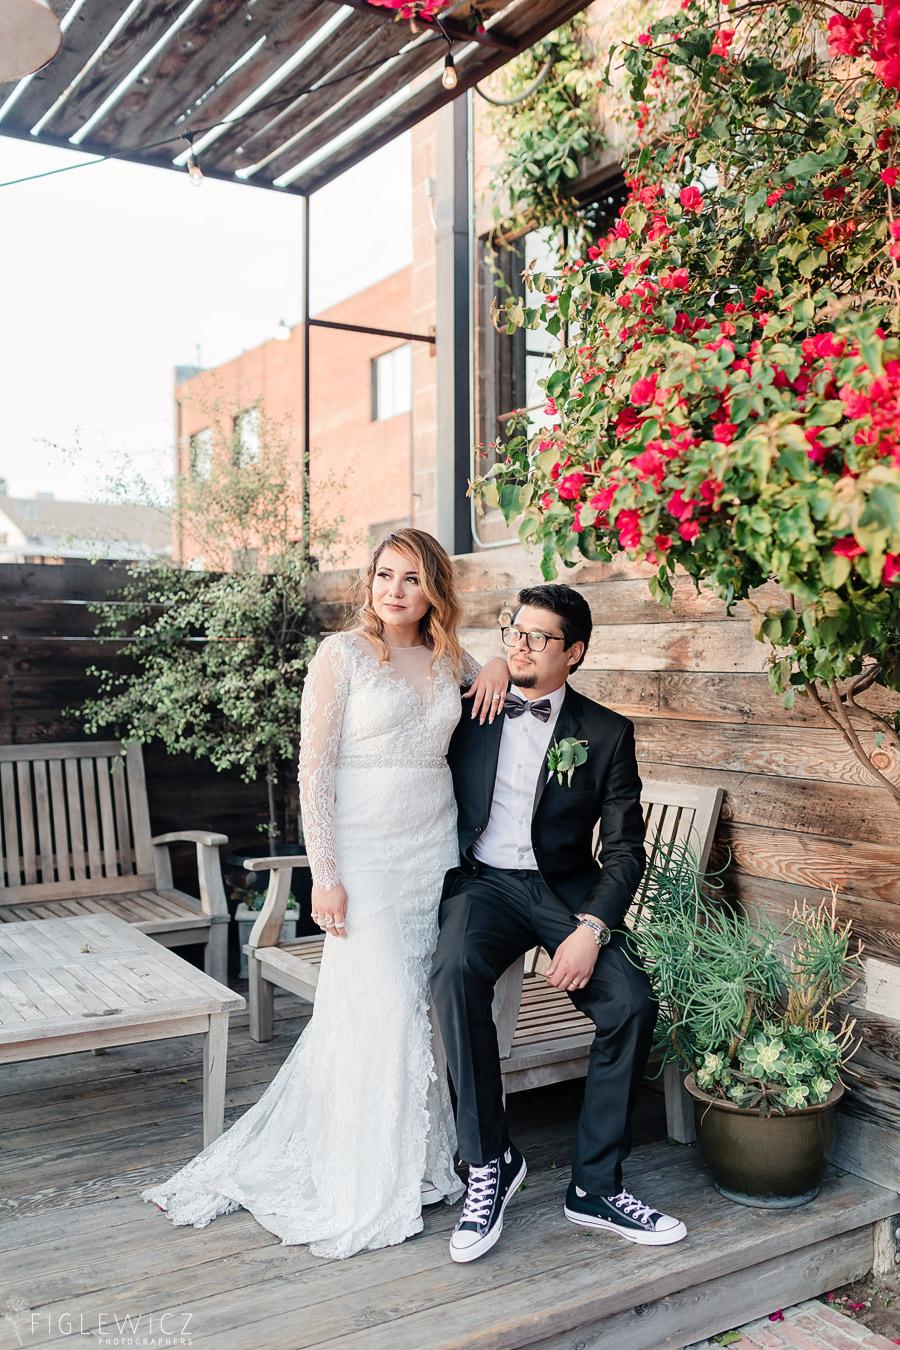 Smokey Hollows Bride and Groom